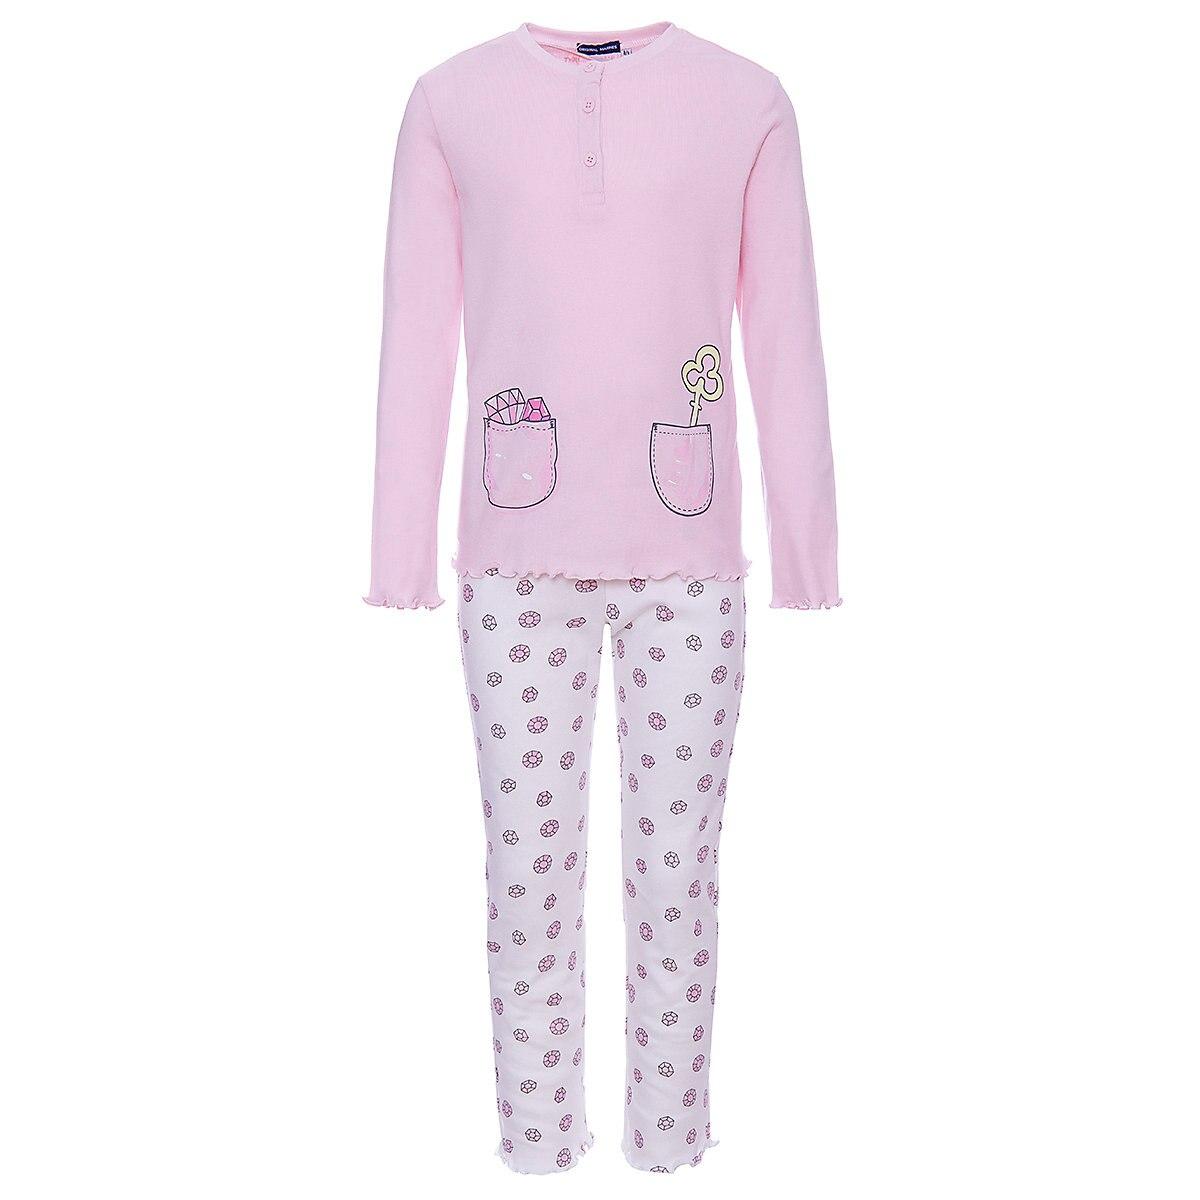 ORIGINAL MARINES Pajama Sets 9501093 Cotton Girls childrens clothing Sleepwear Robe parrot print cami pajama set with robe